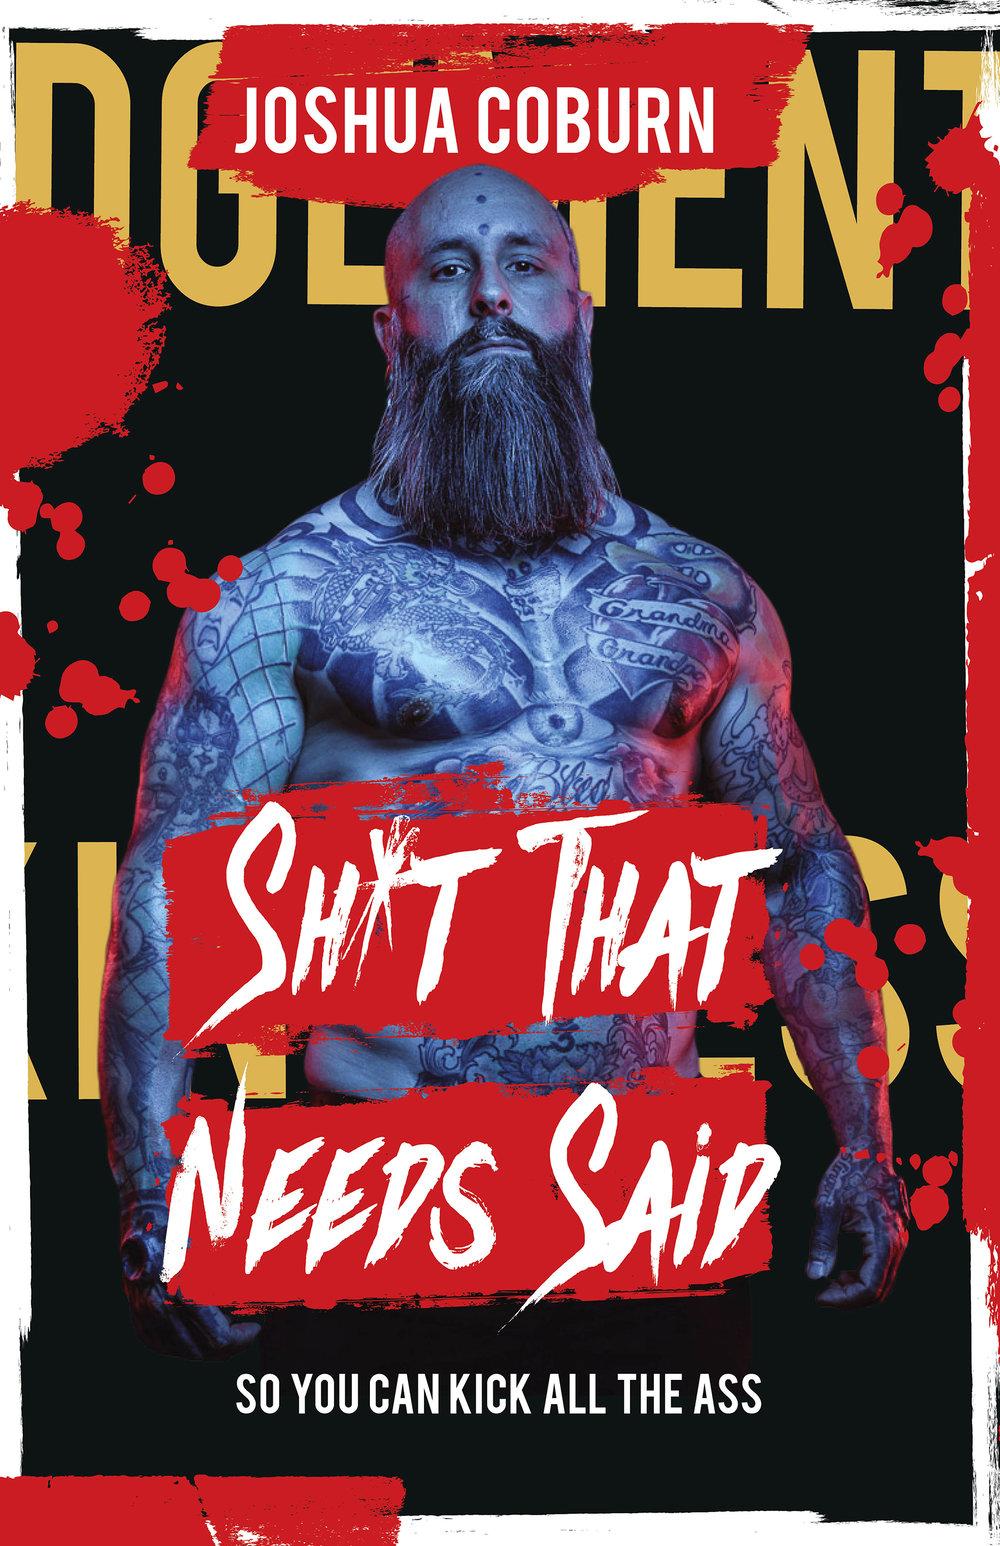 Kick-All-The-Ass Poster _small.jpg